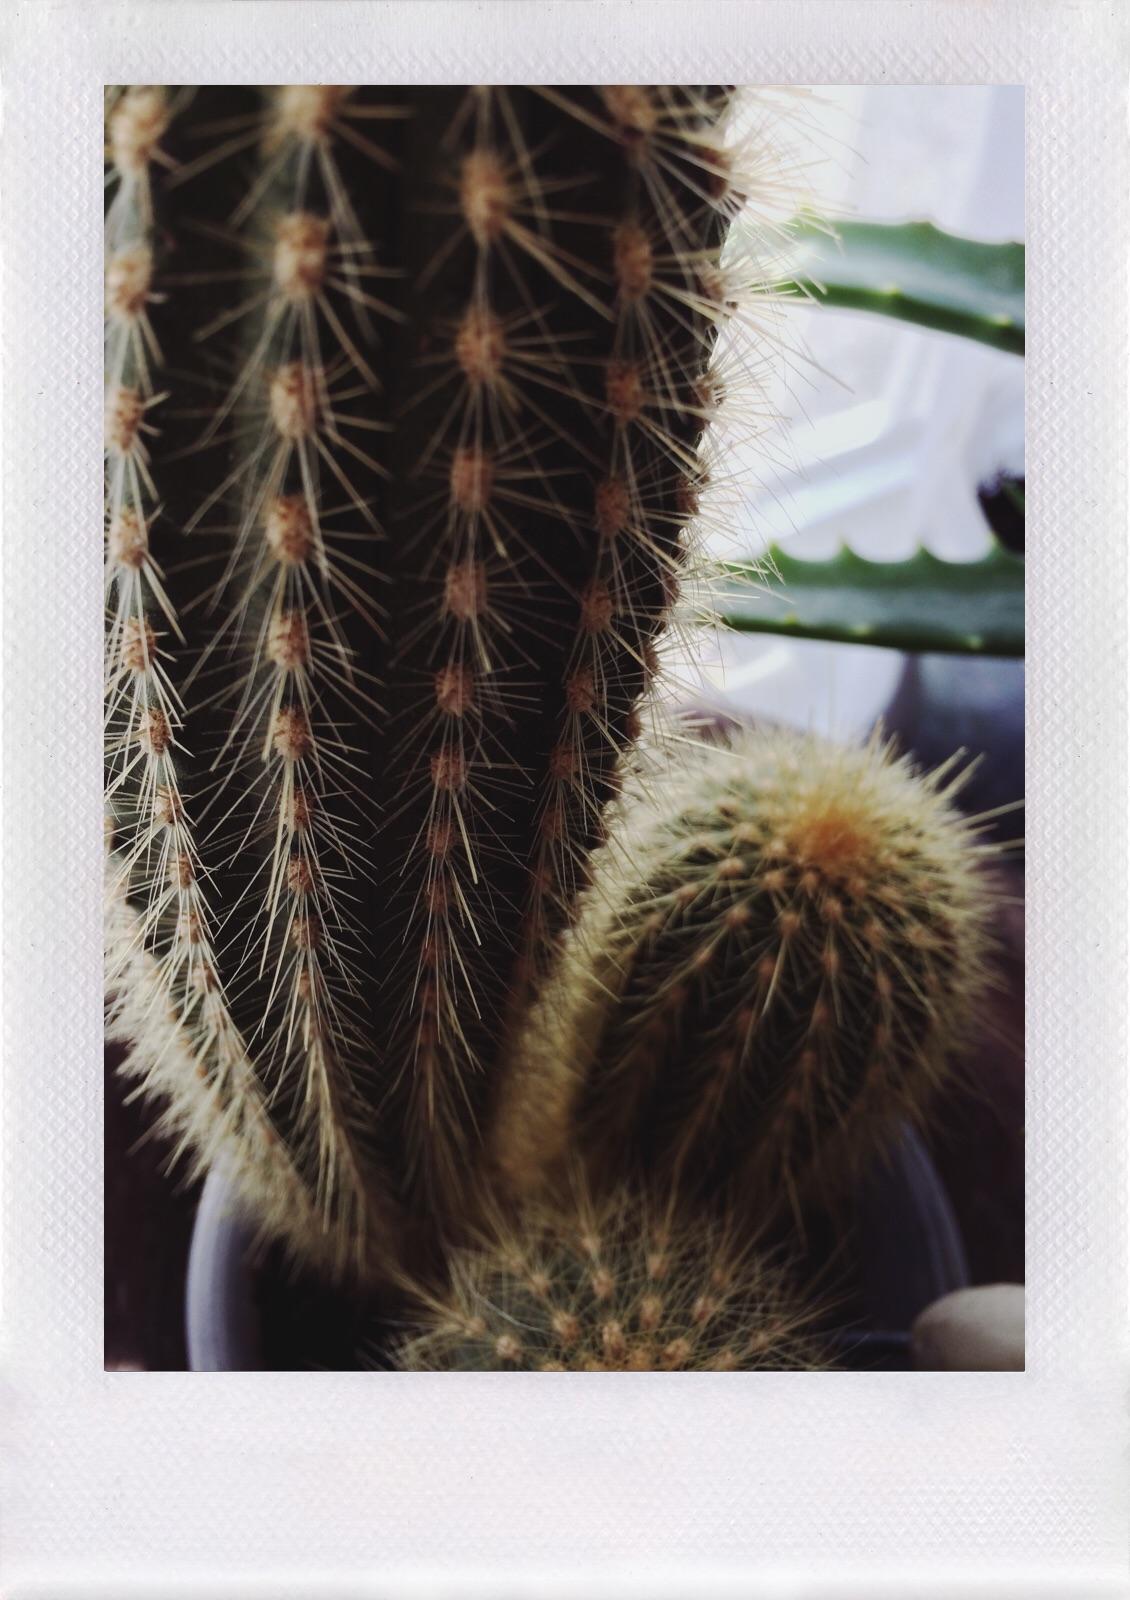 Jennifer Michie Cactus 2